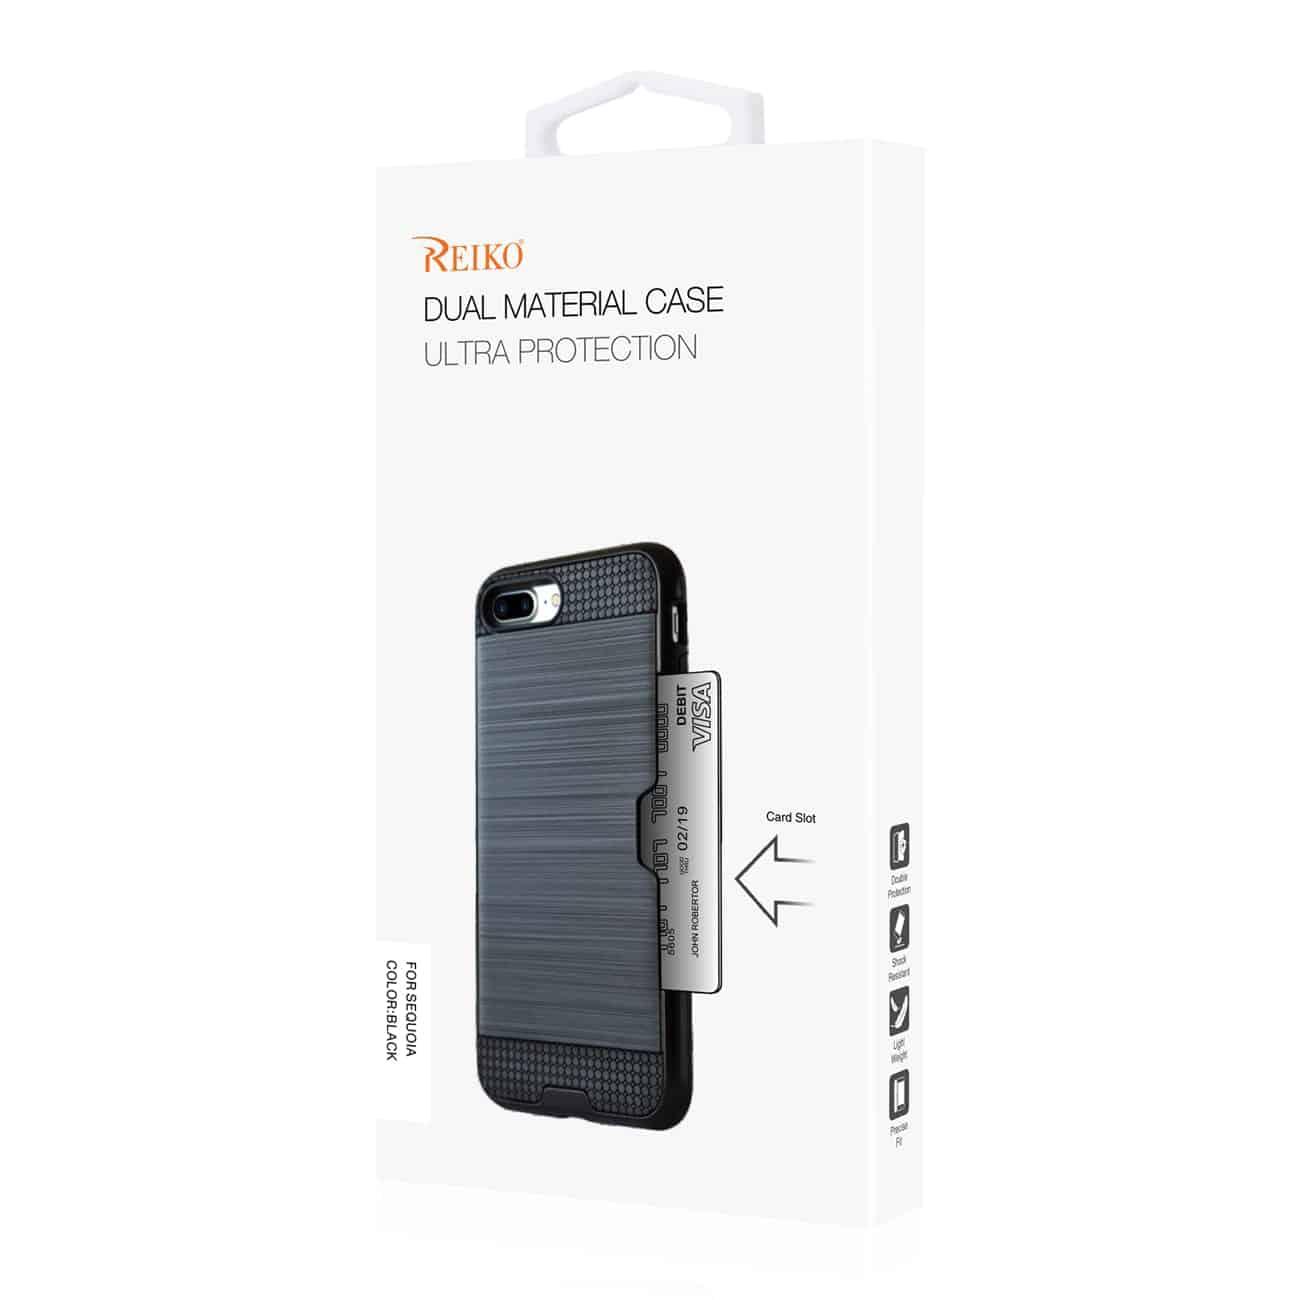 Zte Blade Z Max/Z982/Zte Sequoia Slim Armor Hybrid Case With Card Holder In Black